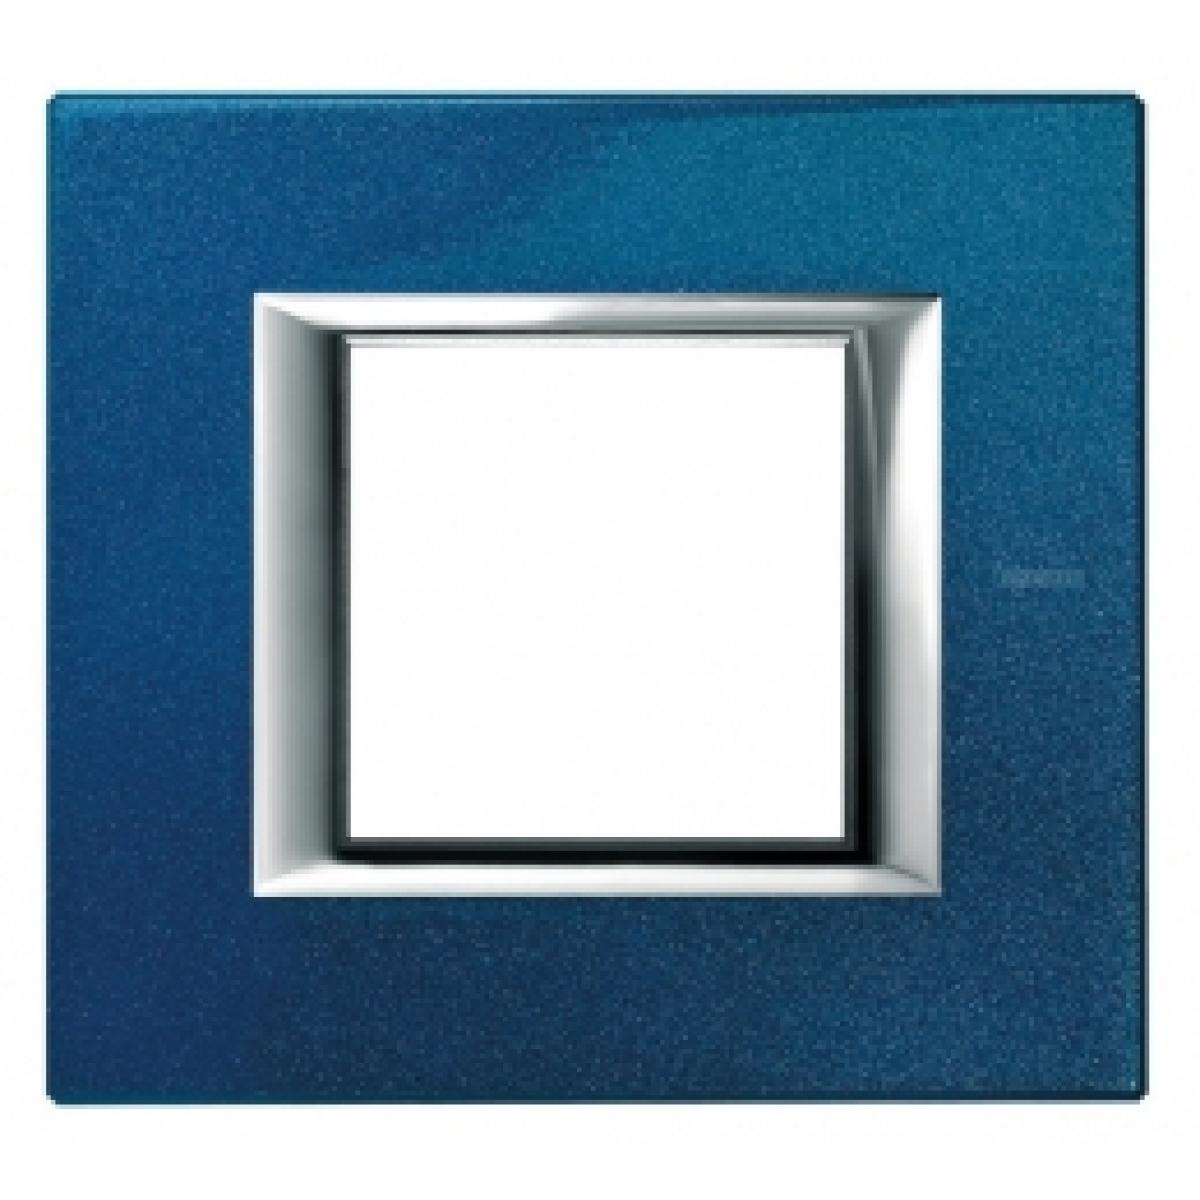 Placca 2 Posti Bticino Axolute Blu Meissen HA4802BM